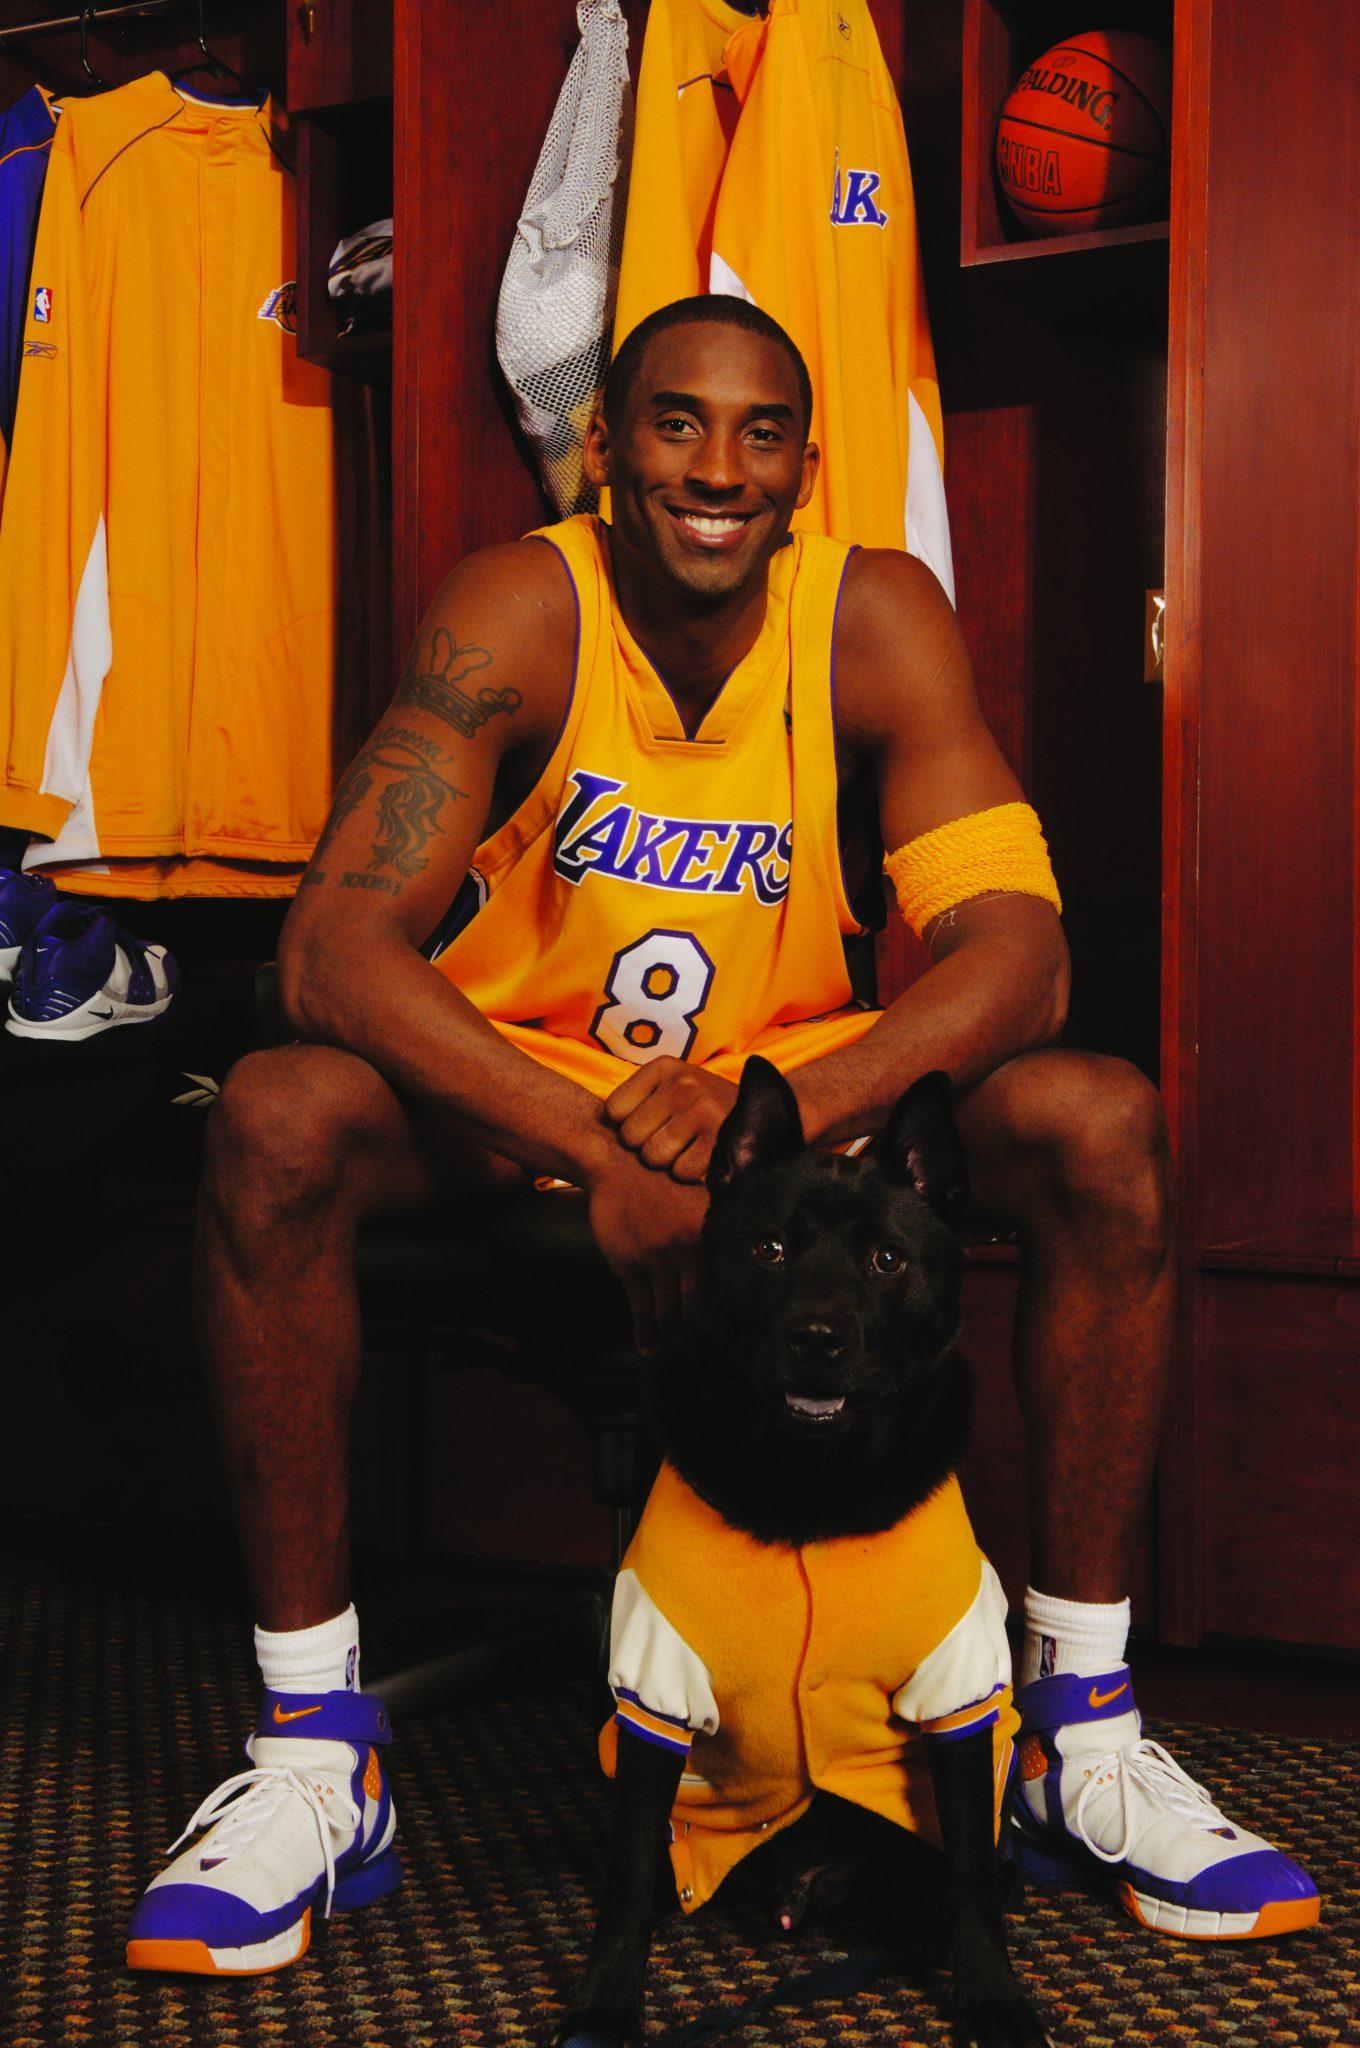 Pose LA Calendar Charity Lakers The Fair Animal For -